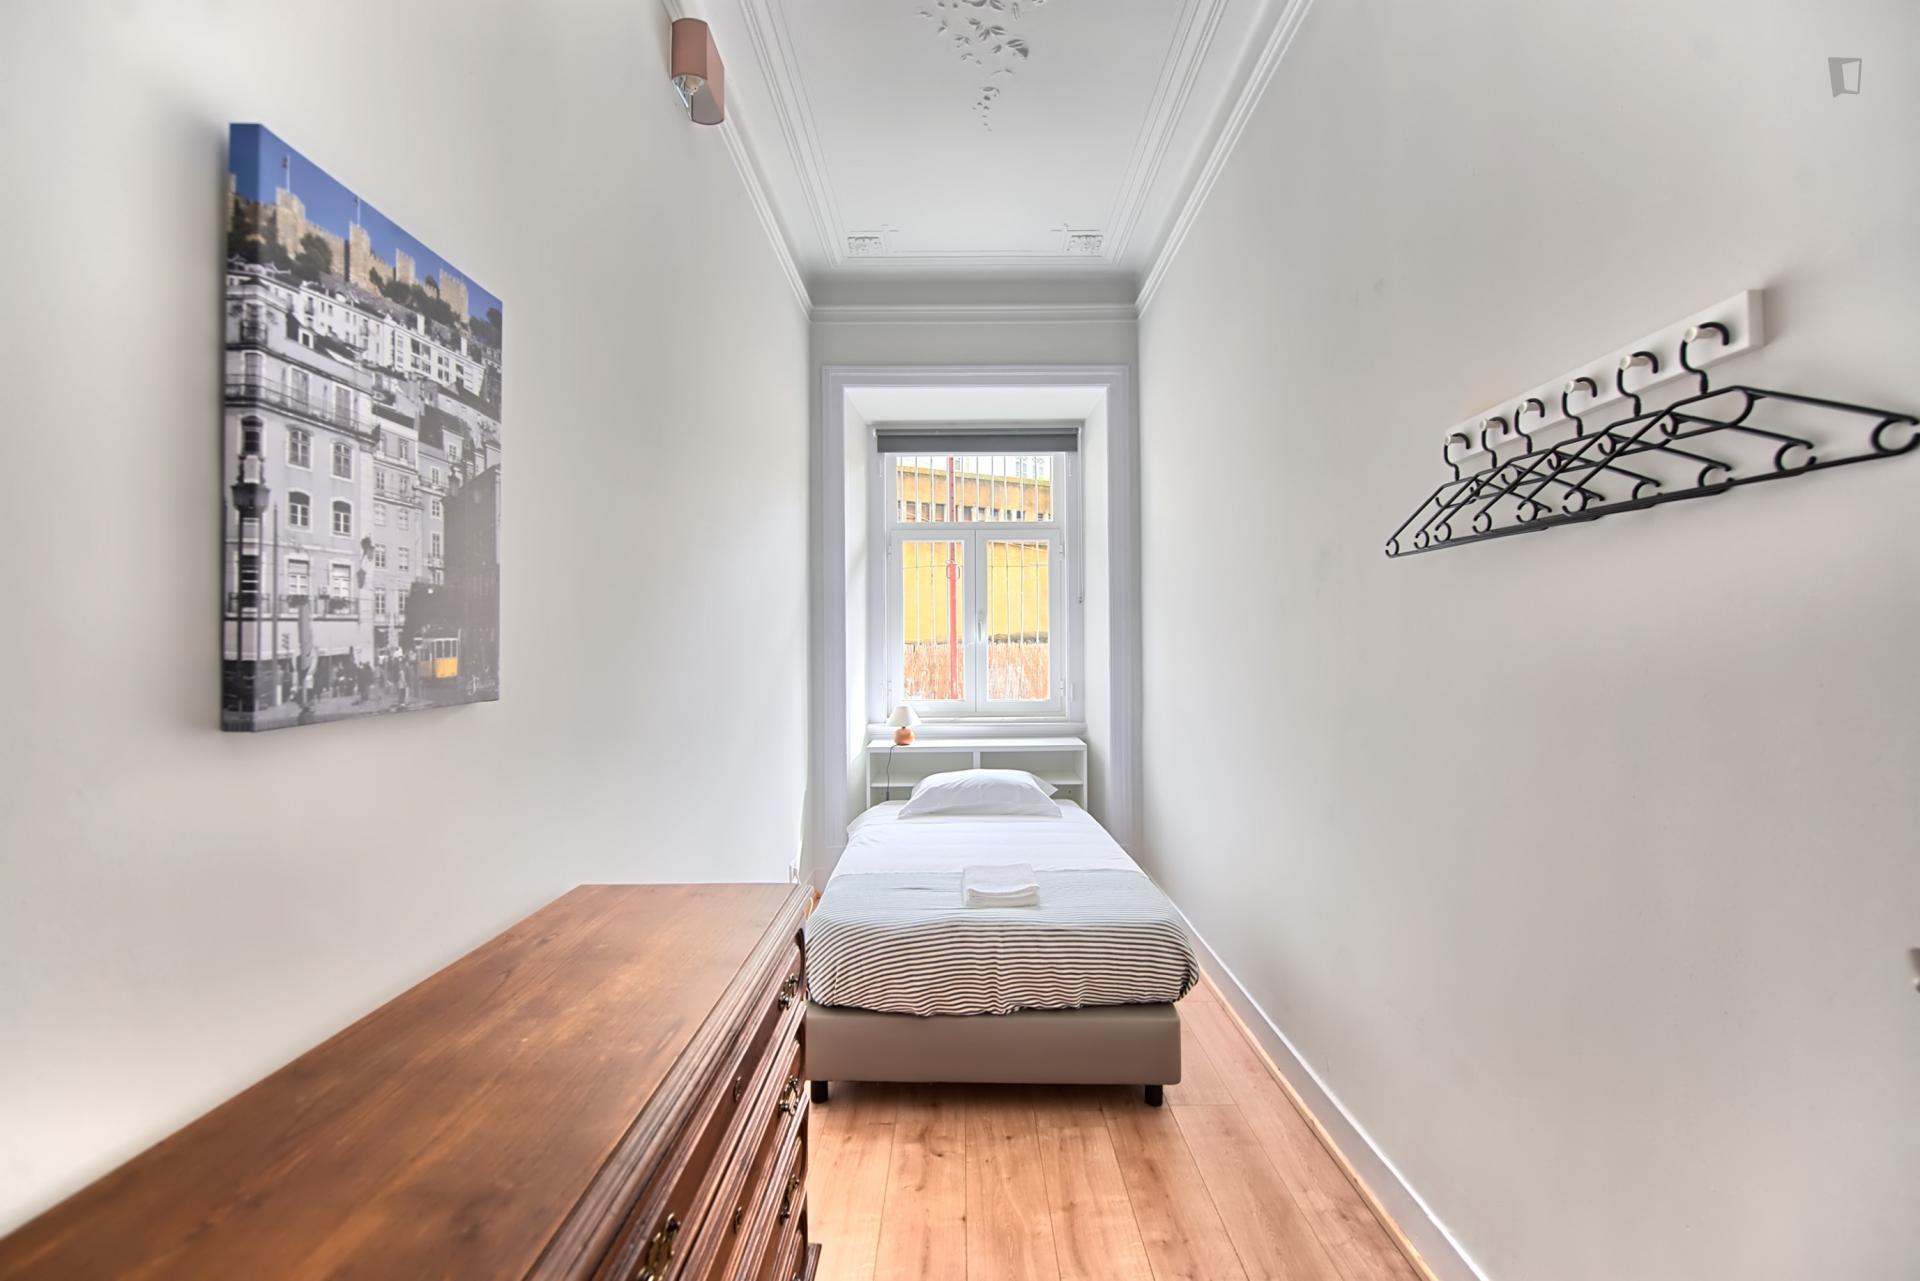 Almirante Reis 2- Spacious 6 Bedroom Apartment in Lisbon